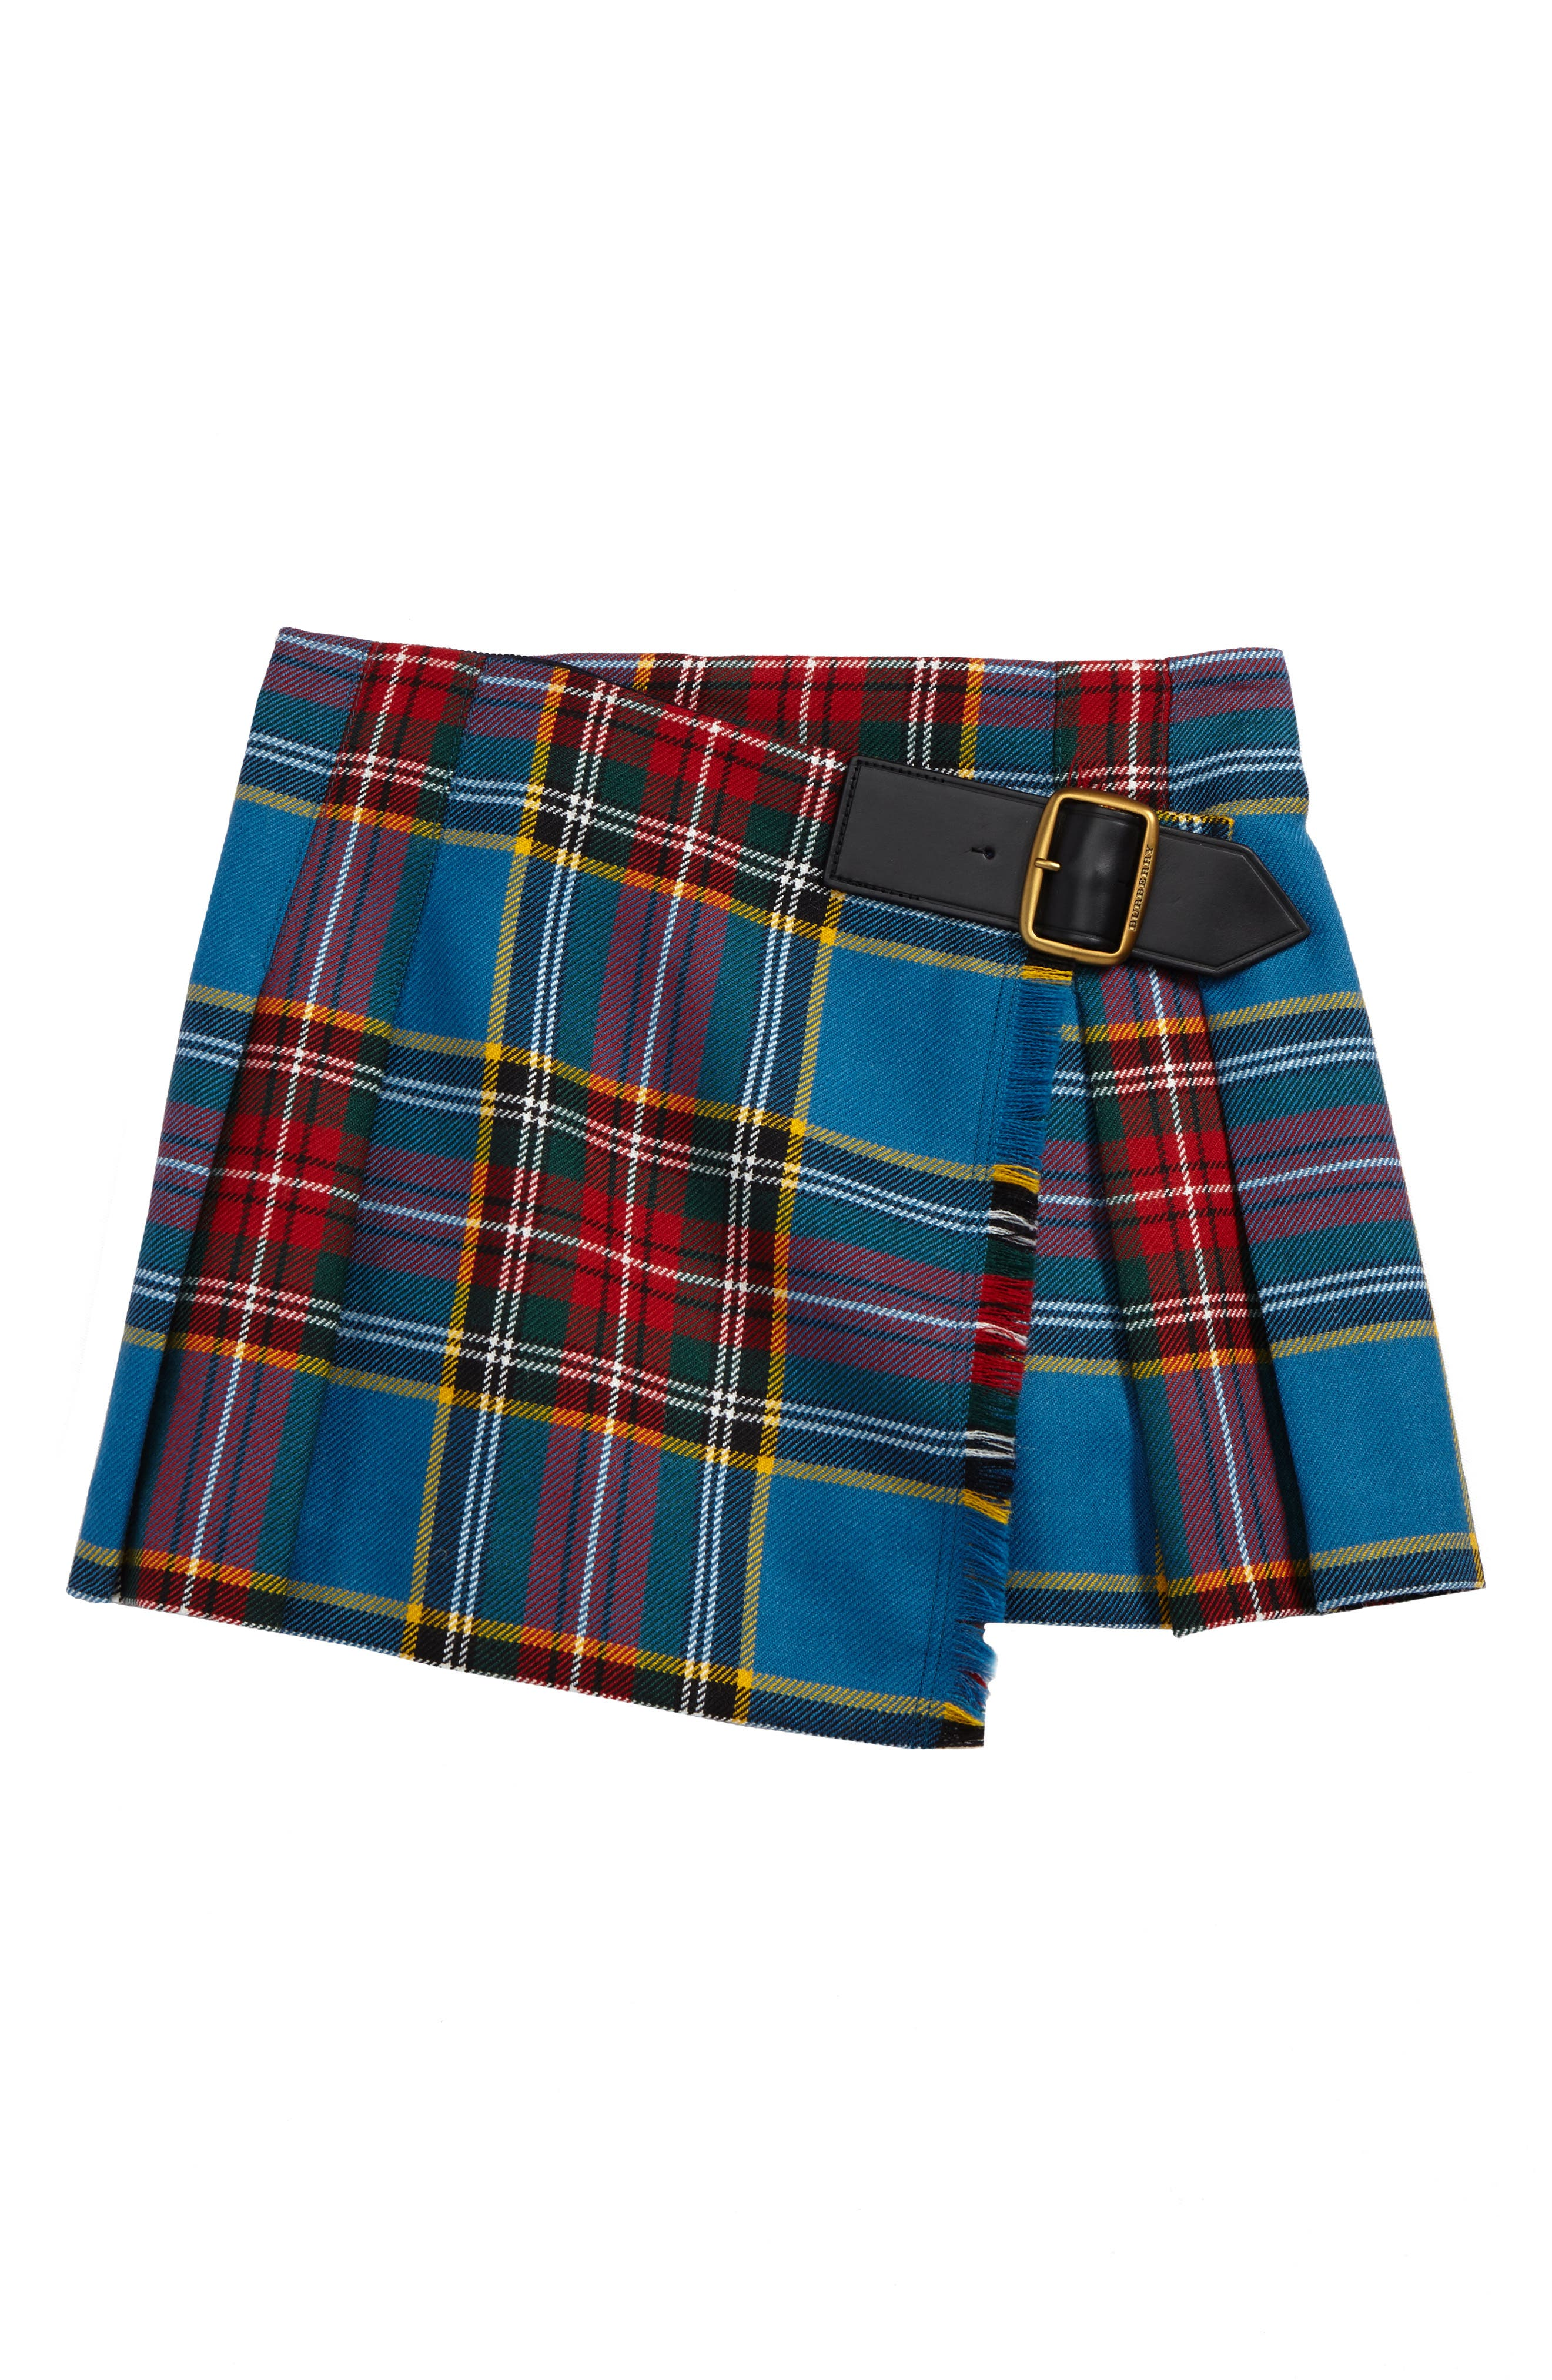 Klorrie Plaid Wool Miniskirt,                         Main,                         color, Cyan Blue